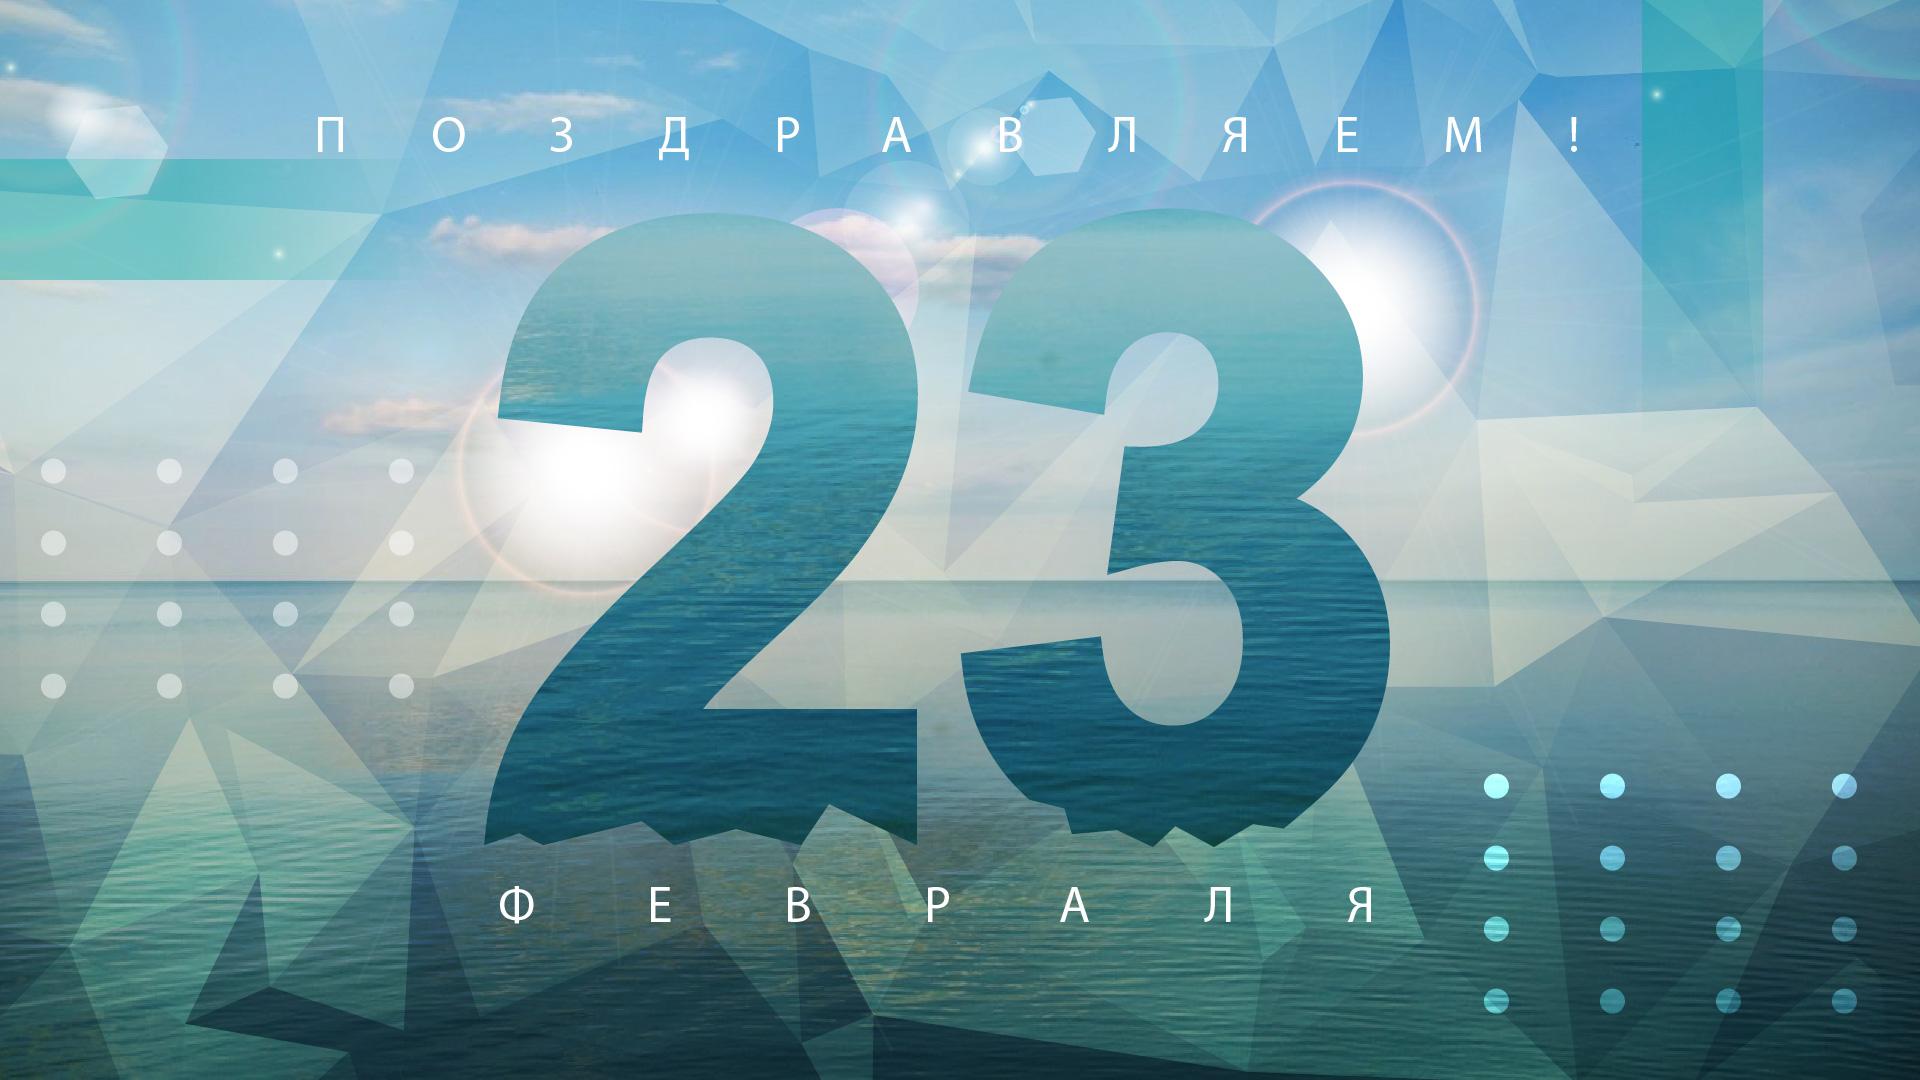 23 evralya